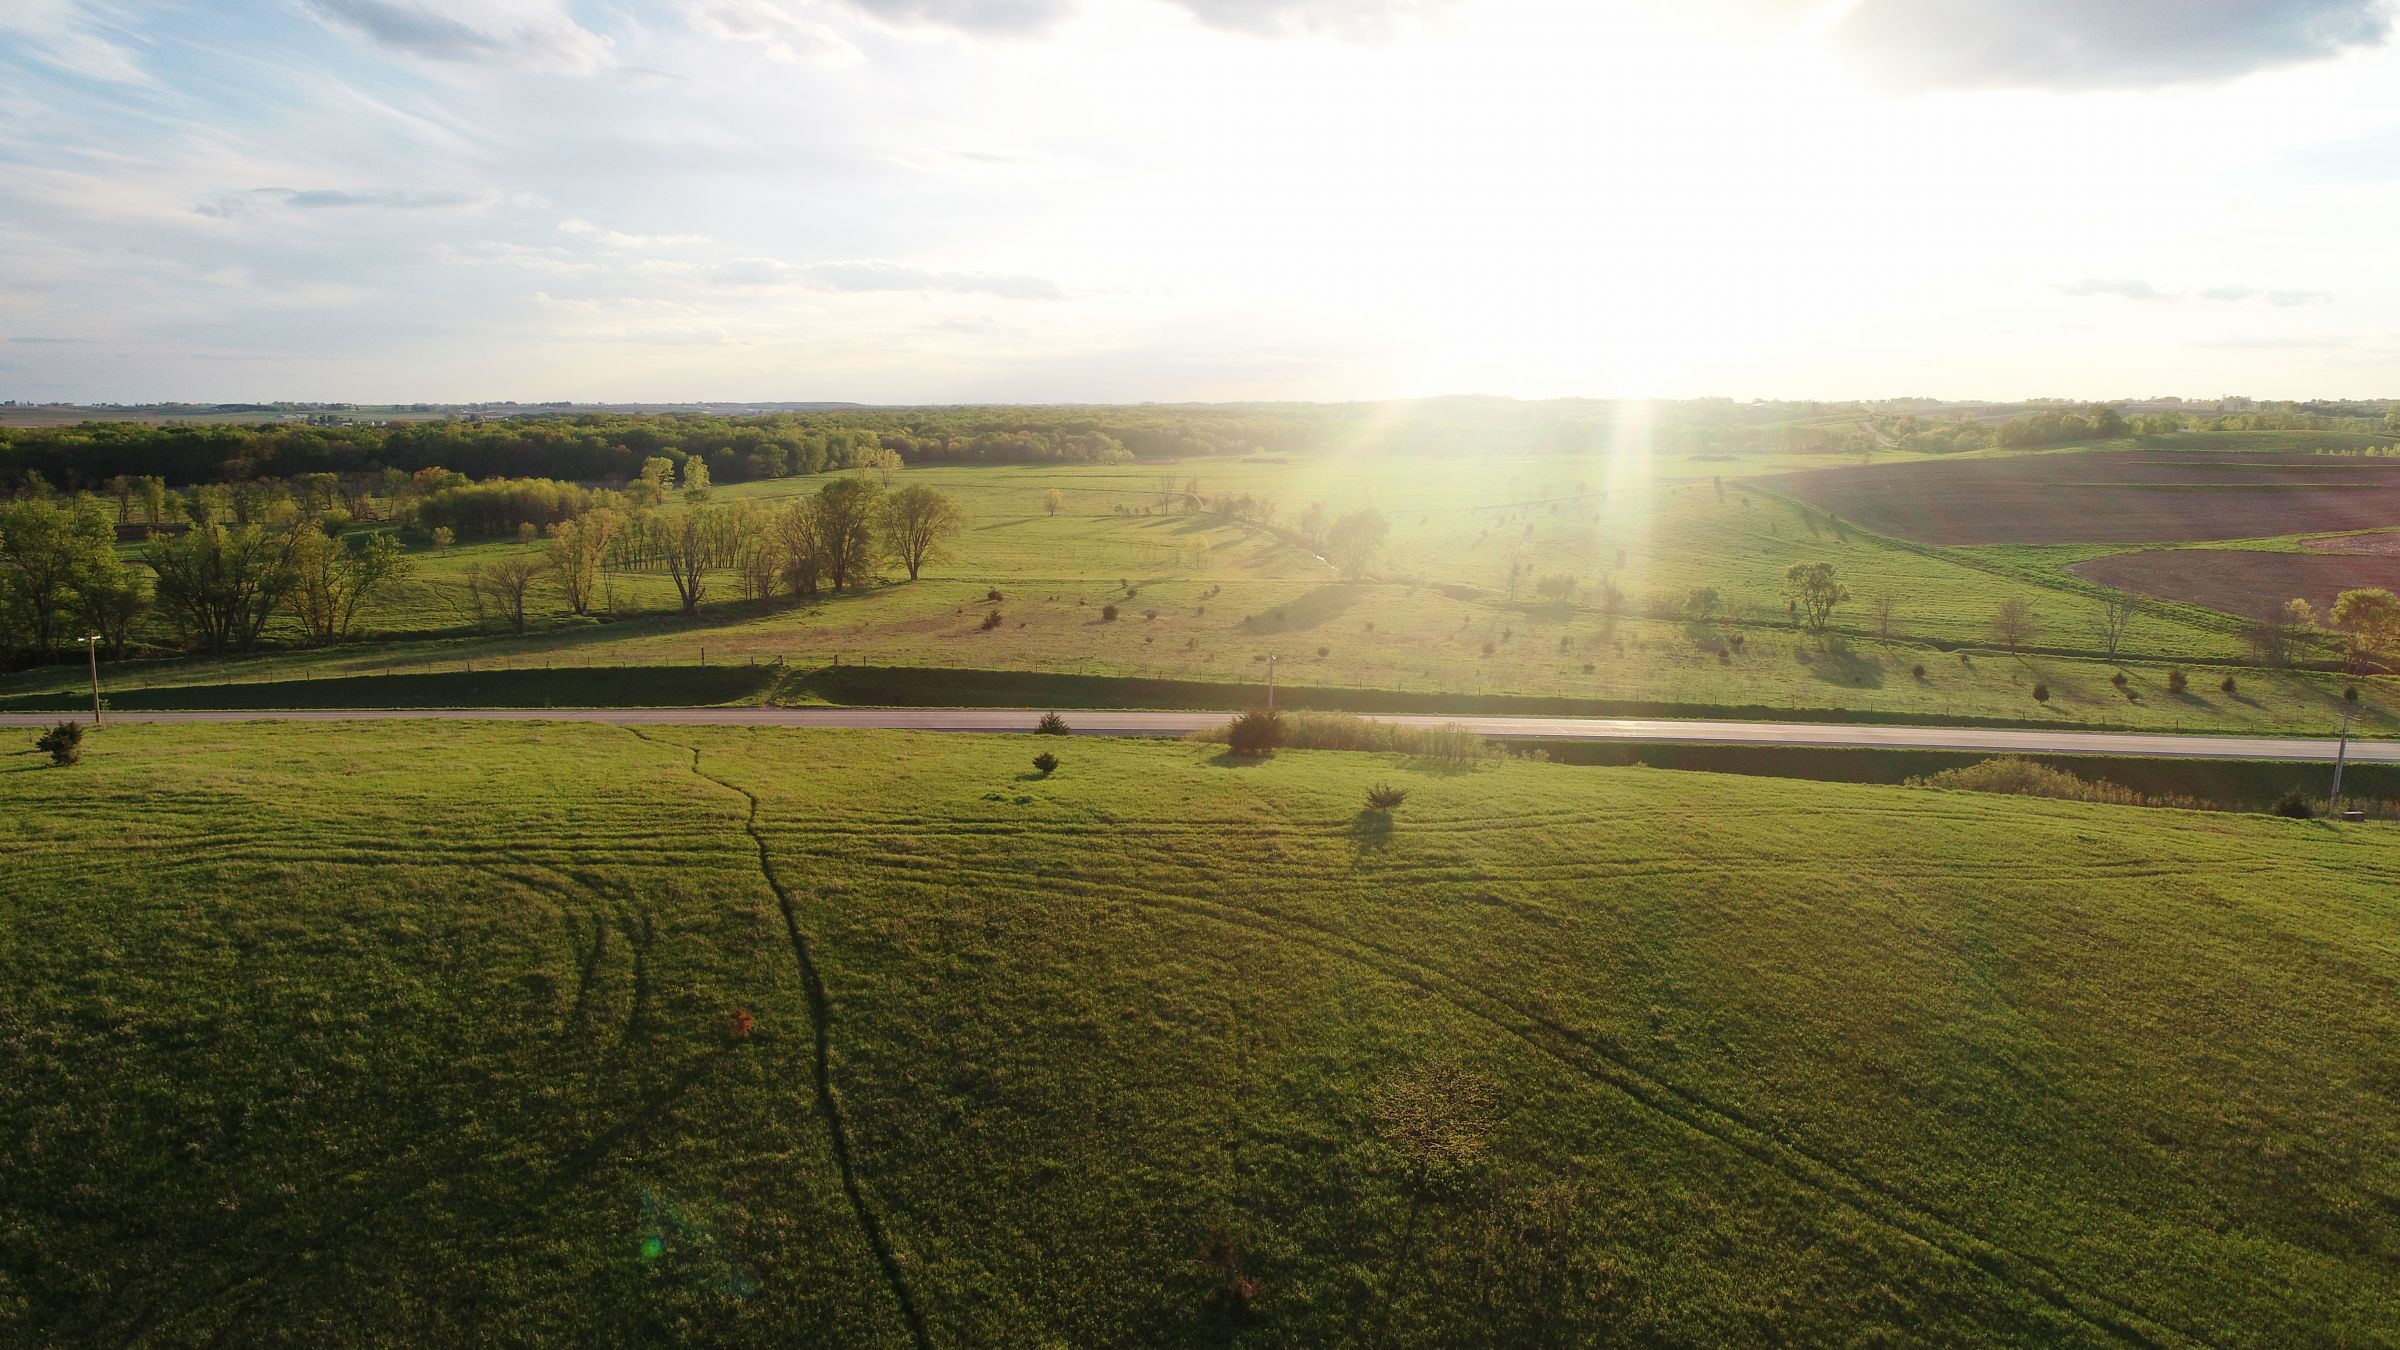 Washington County Iowa Land For Sale 14.jpg